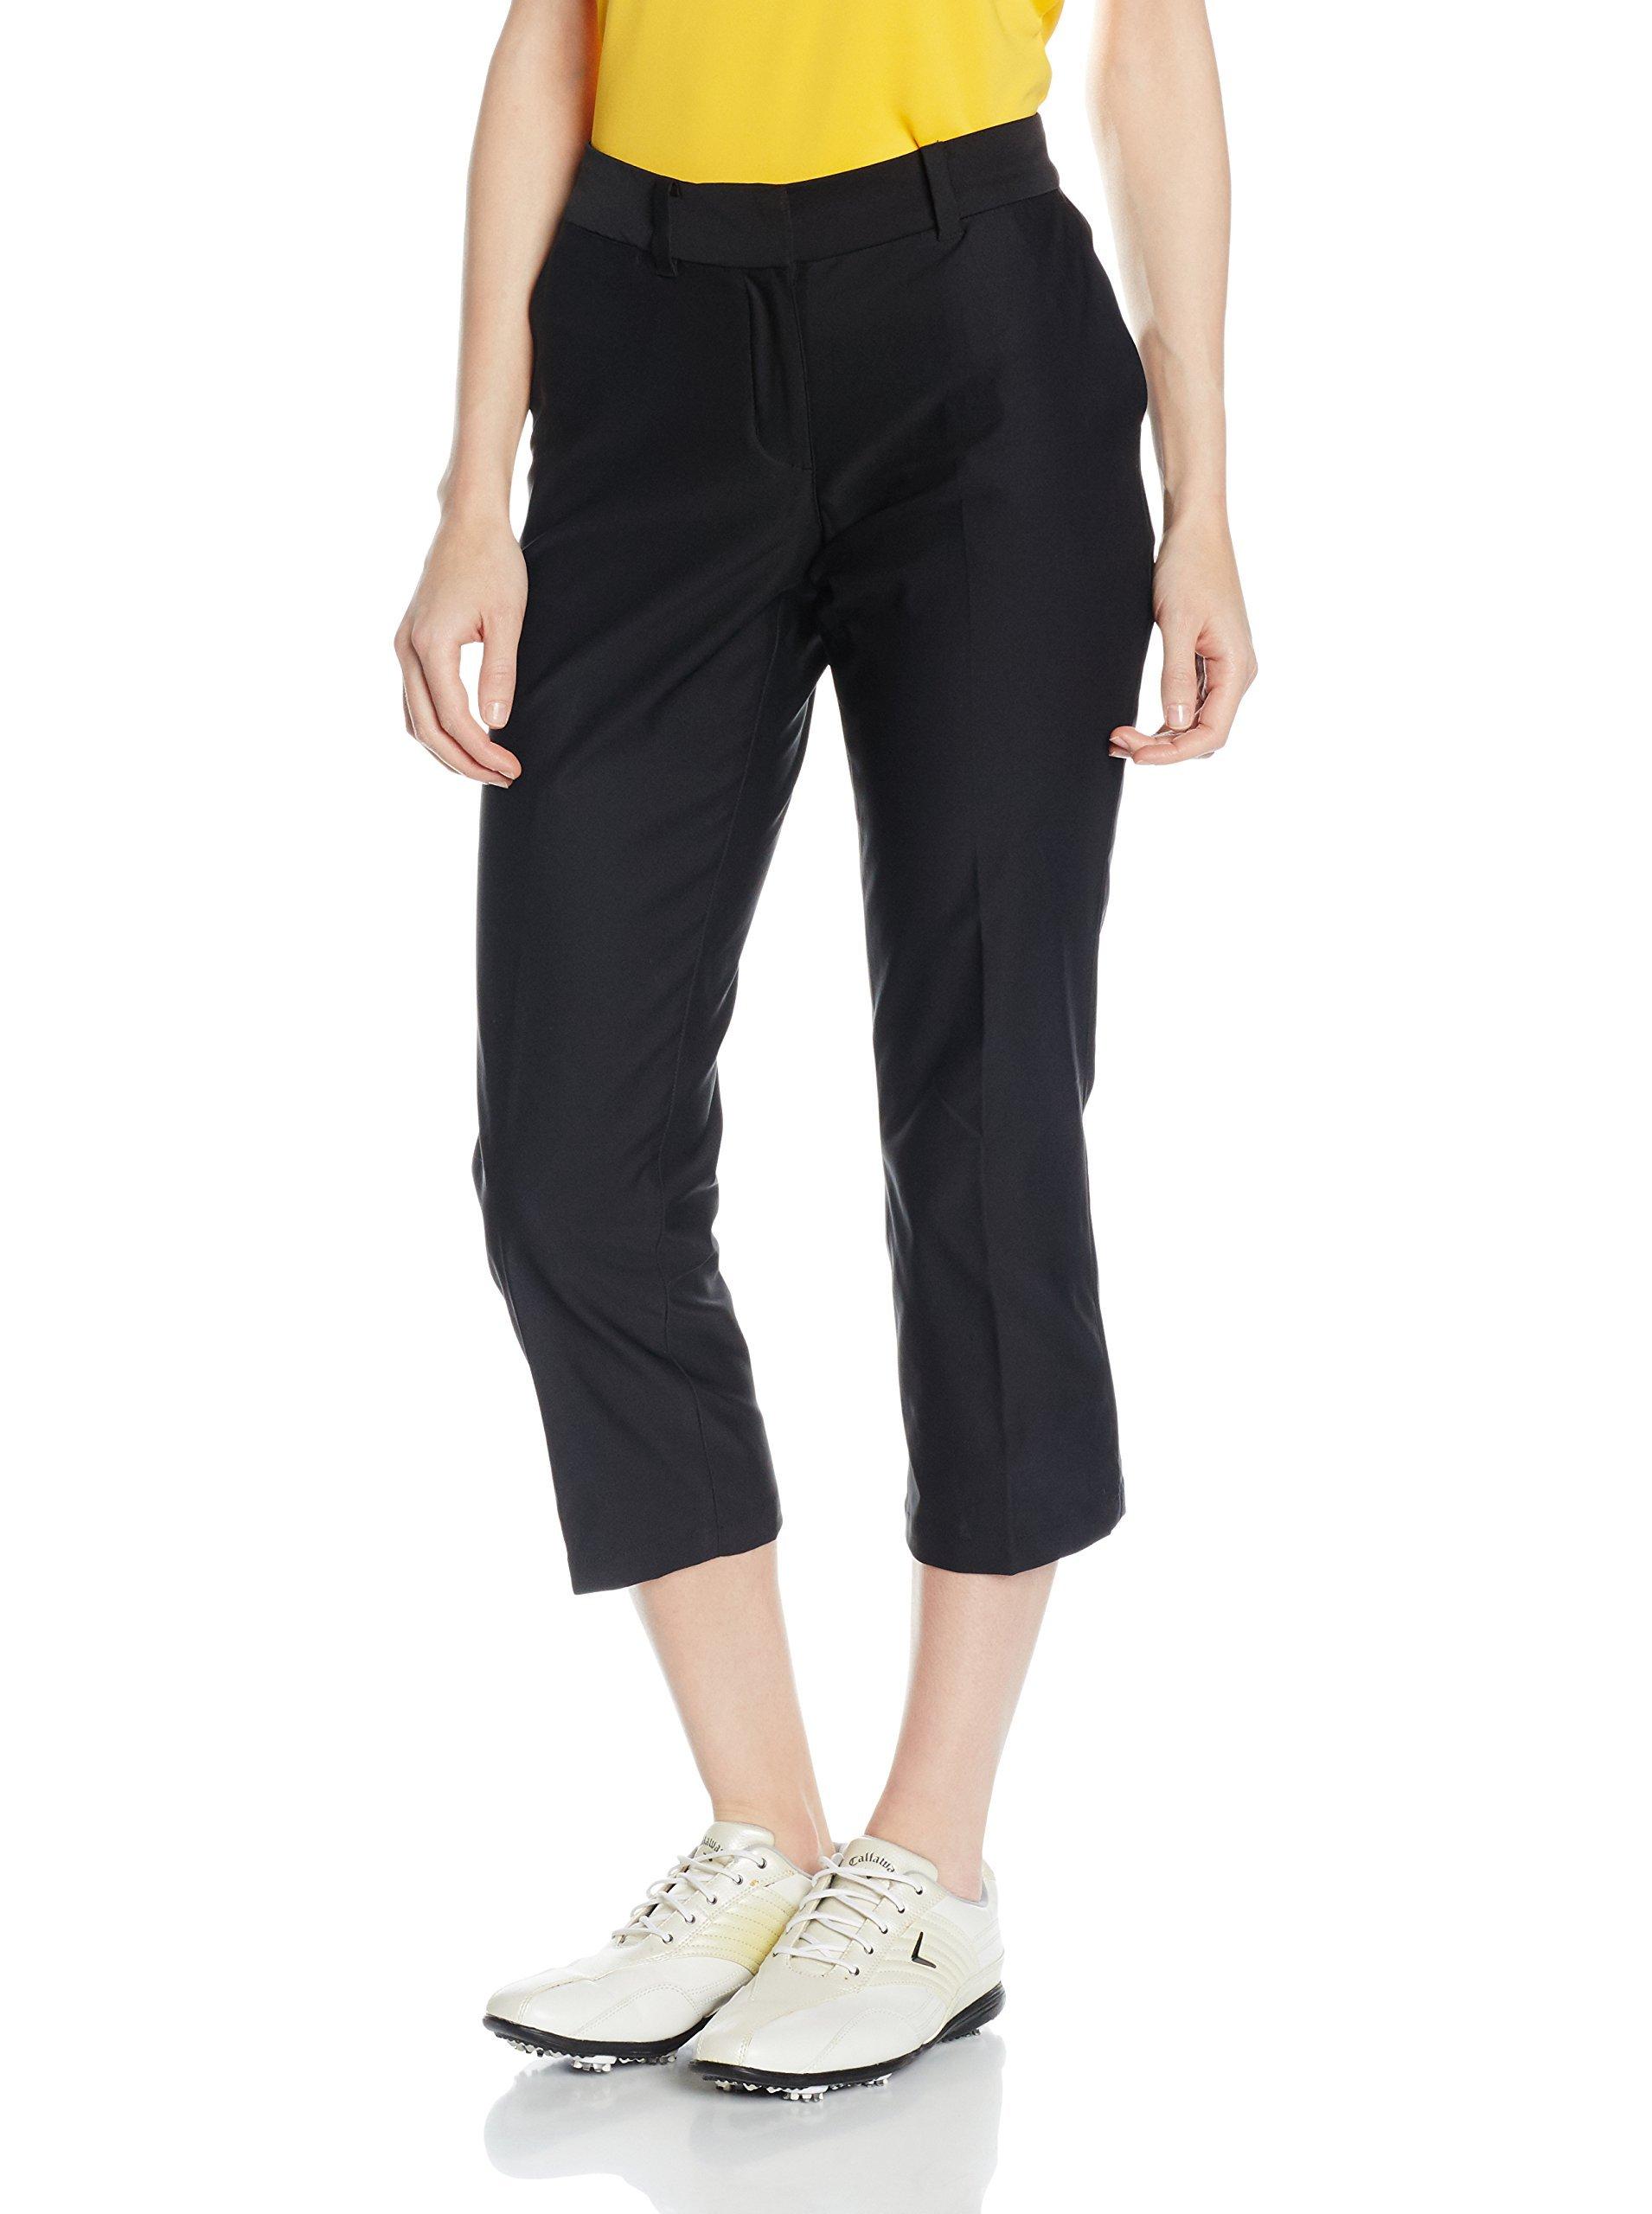 Nike Golf Women's Tournament Crop Black/Black Pants 4